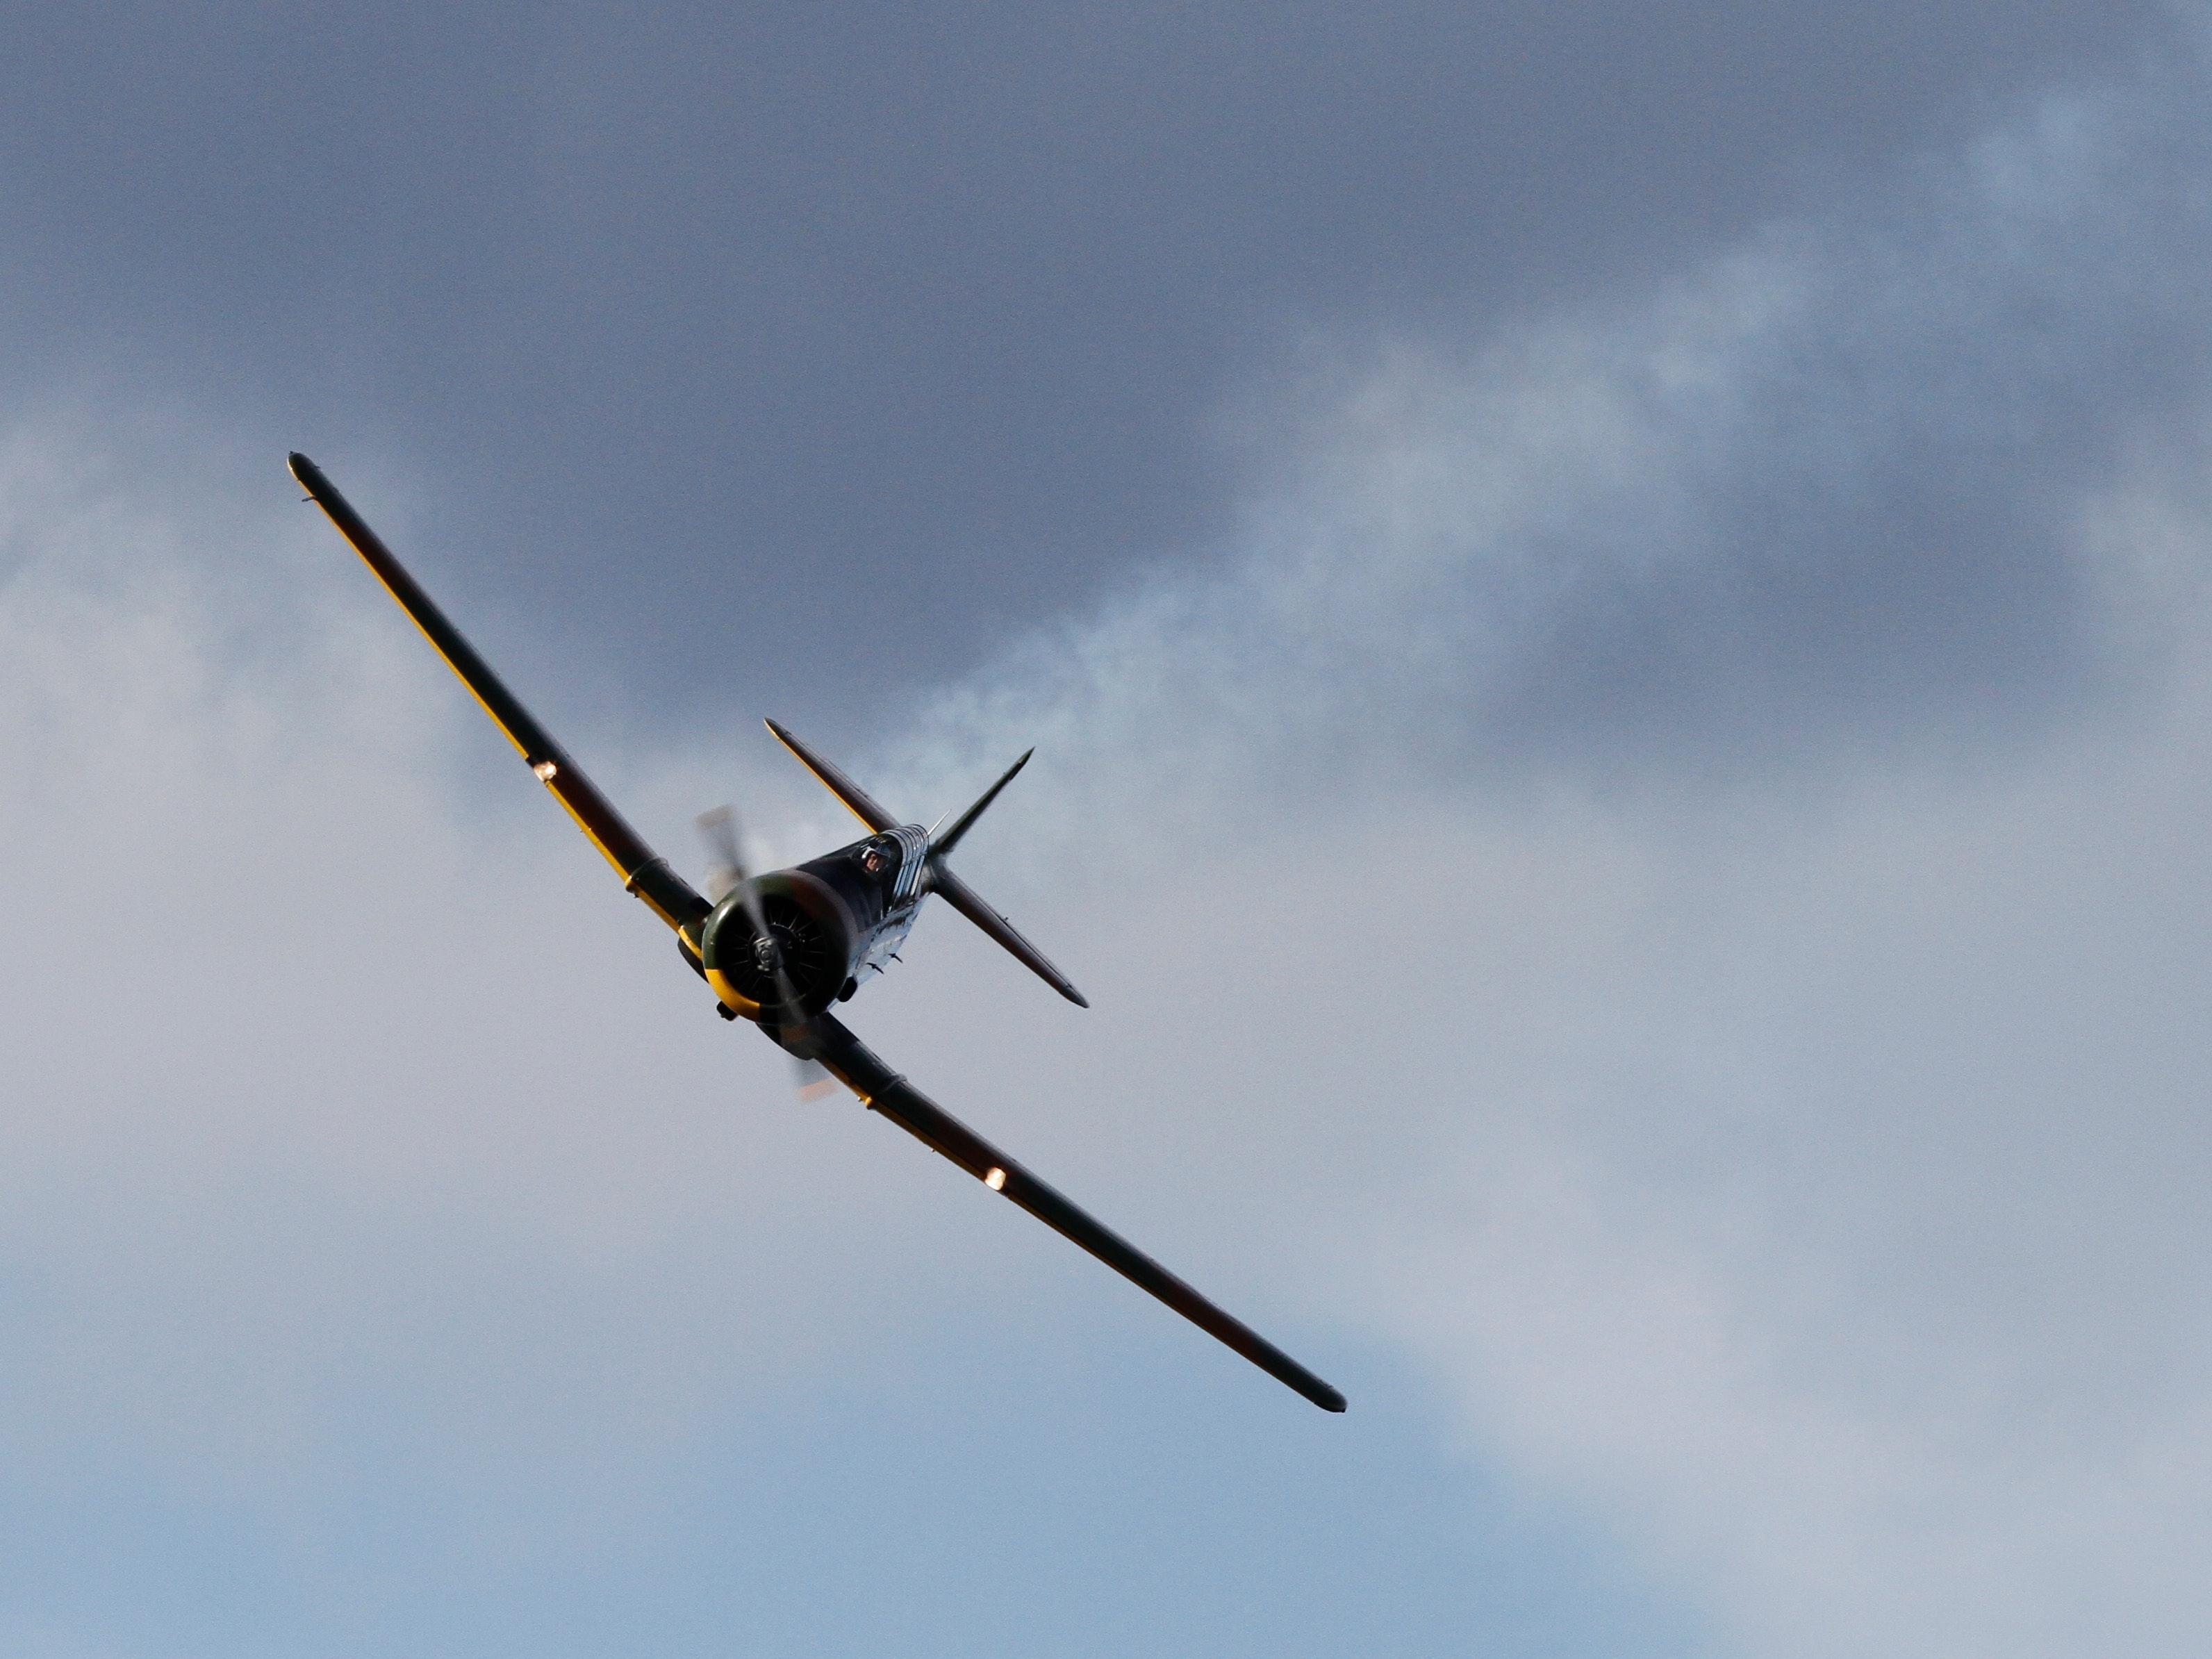 Black Airplane Under Dark Cloud Sky, Aeroplane, Aircraft, Airplane, Aviation, HQ Photo